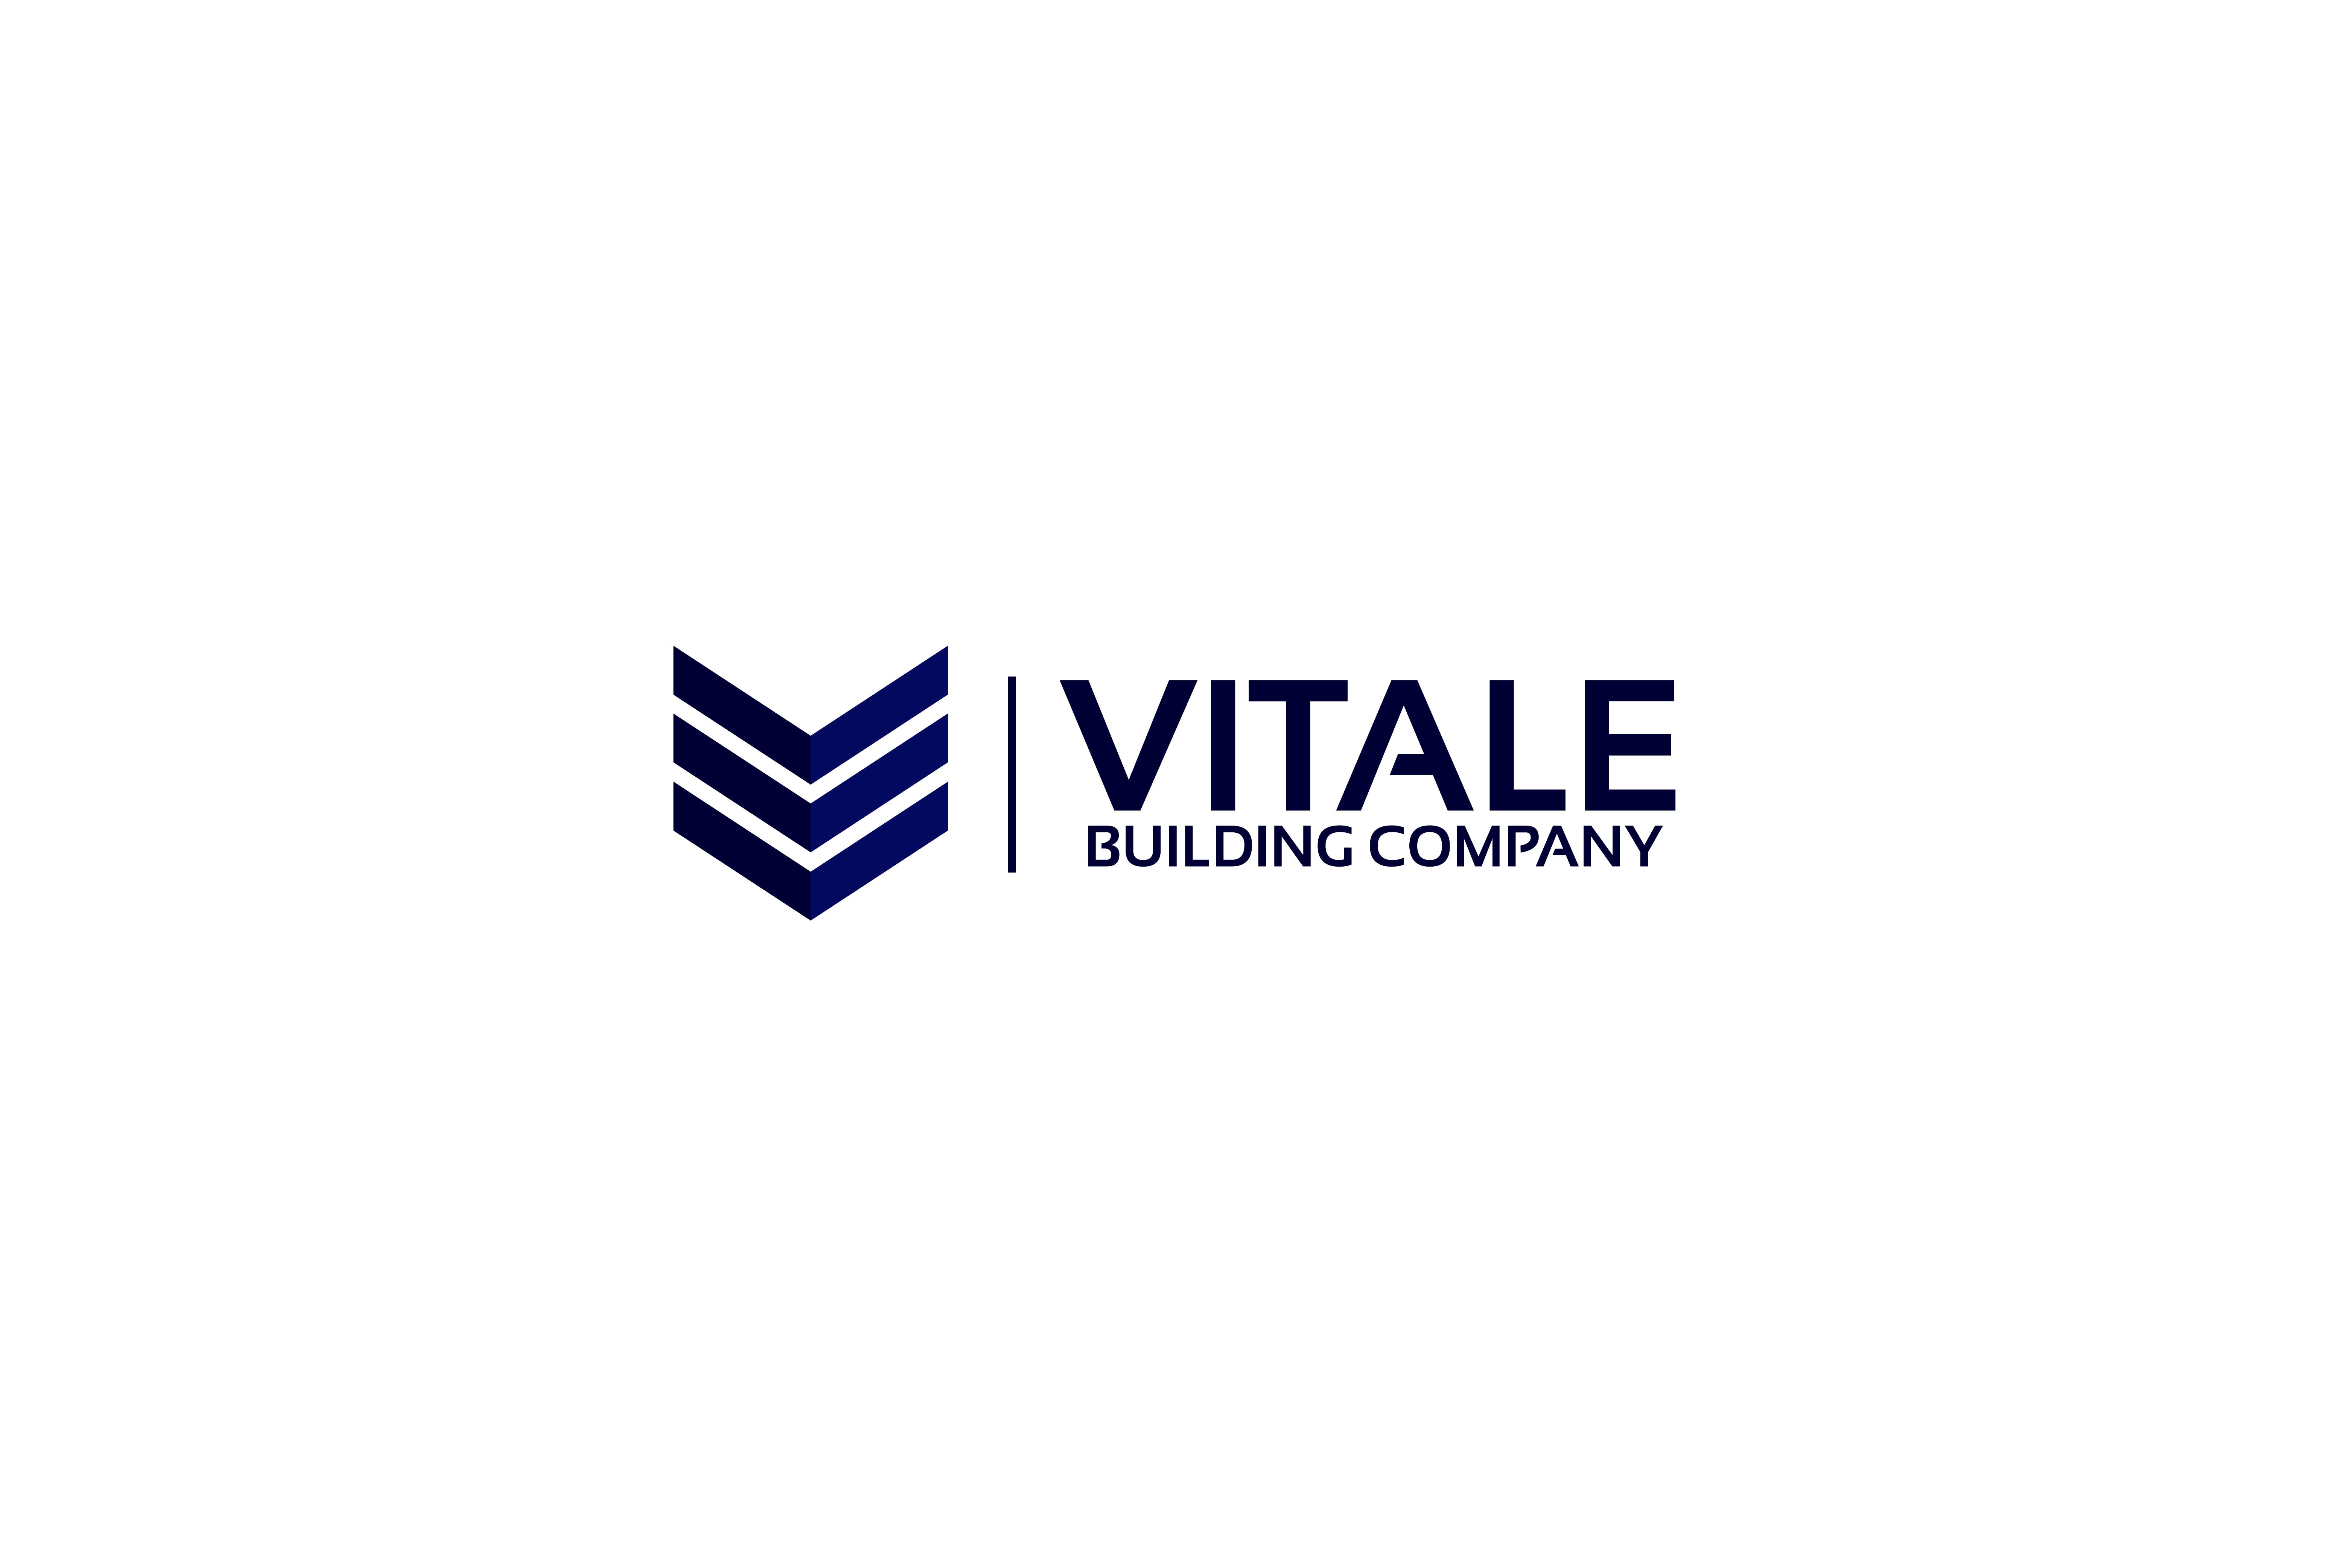 Vitale Building Company Logo